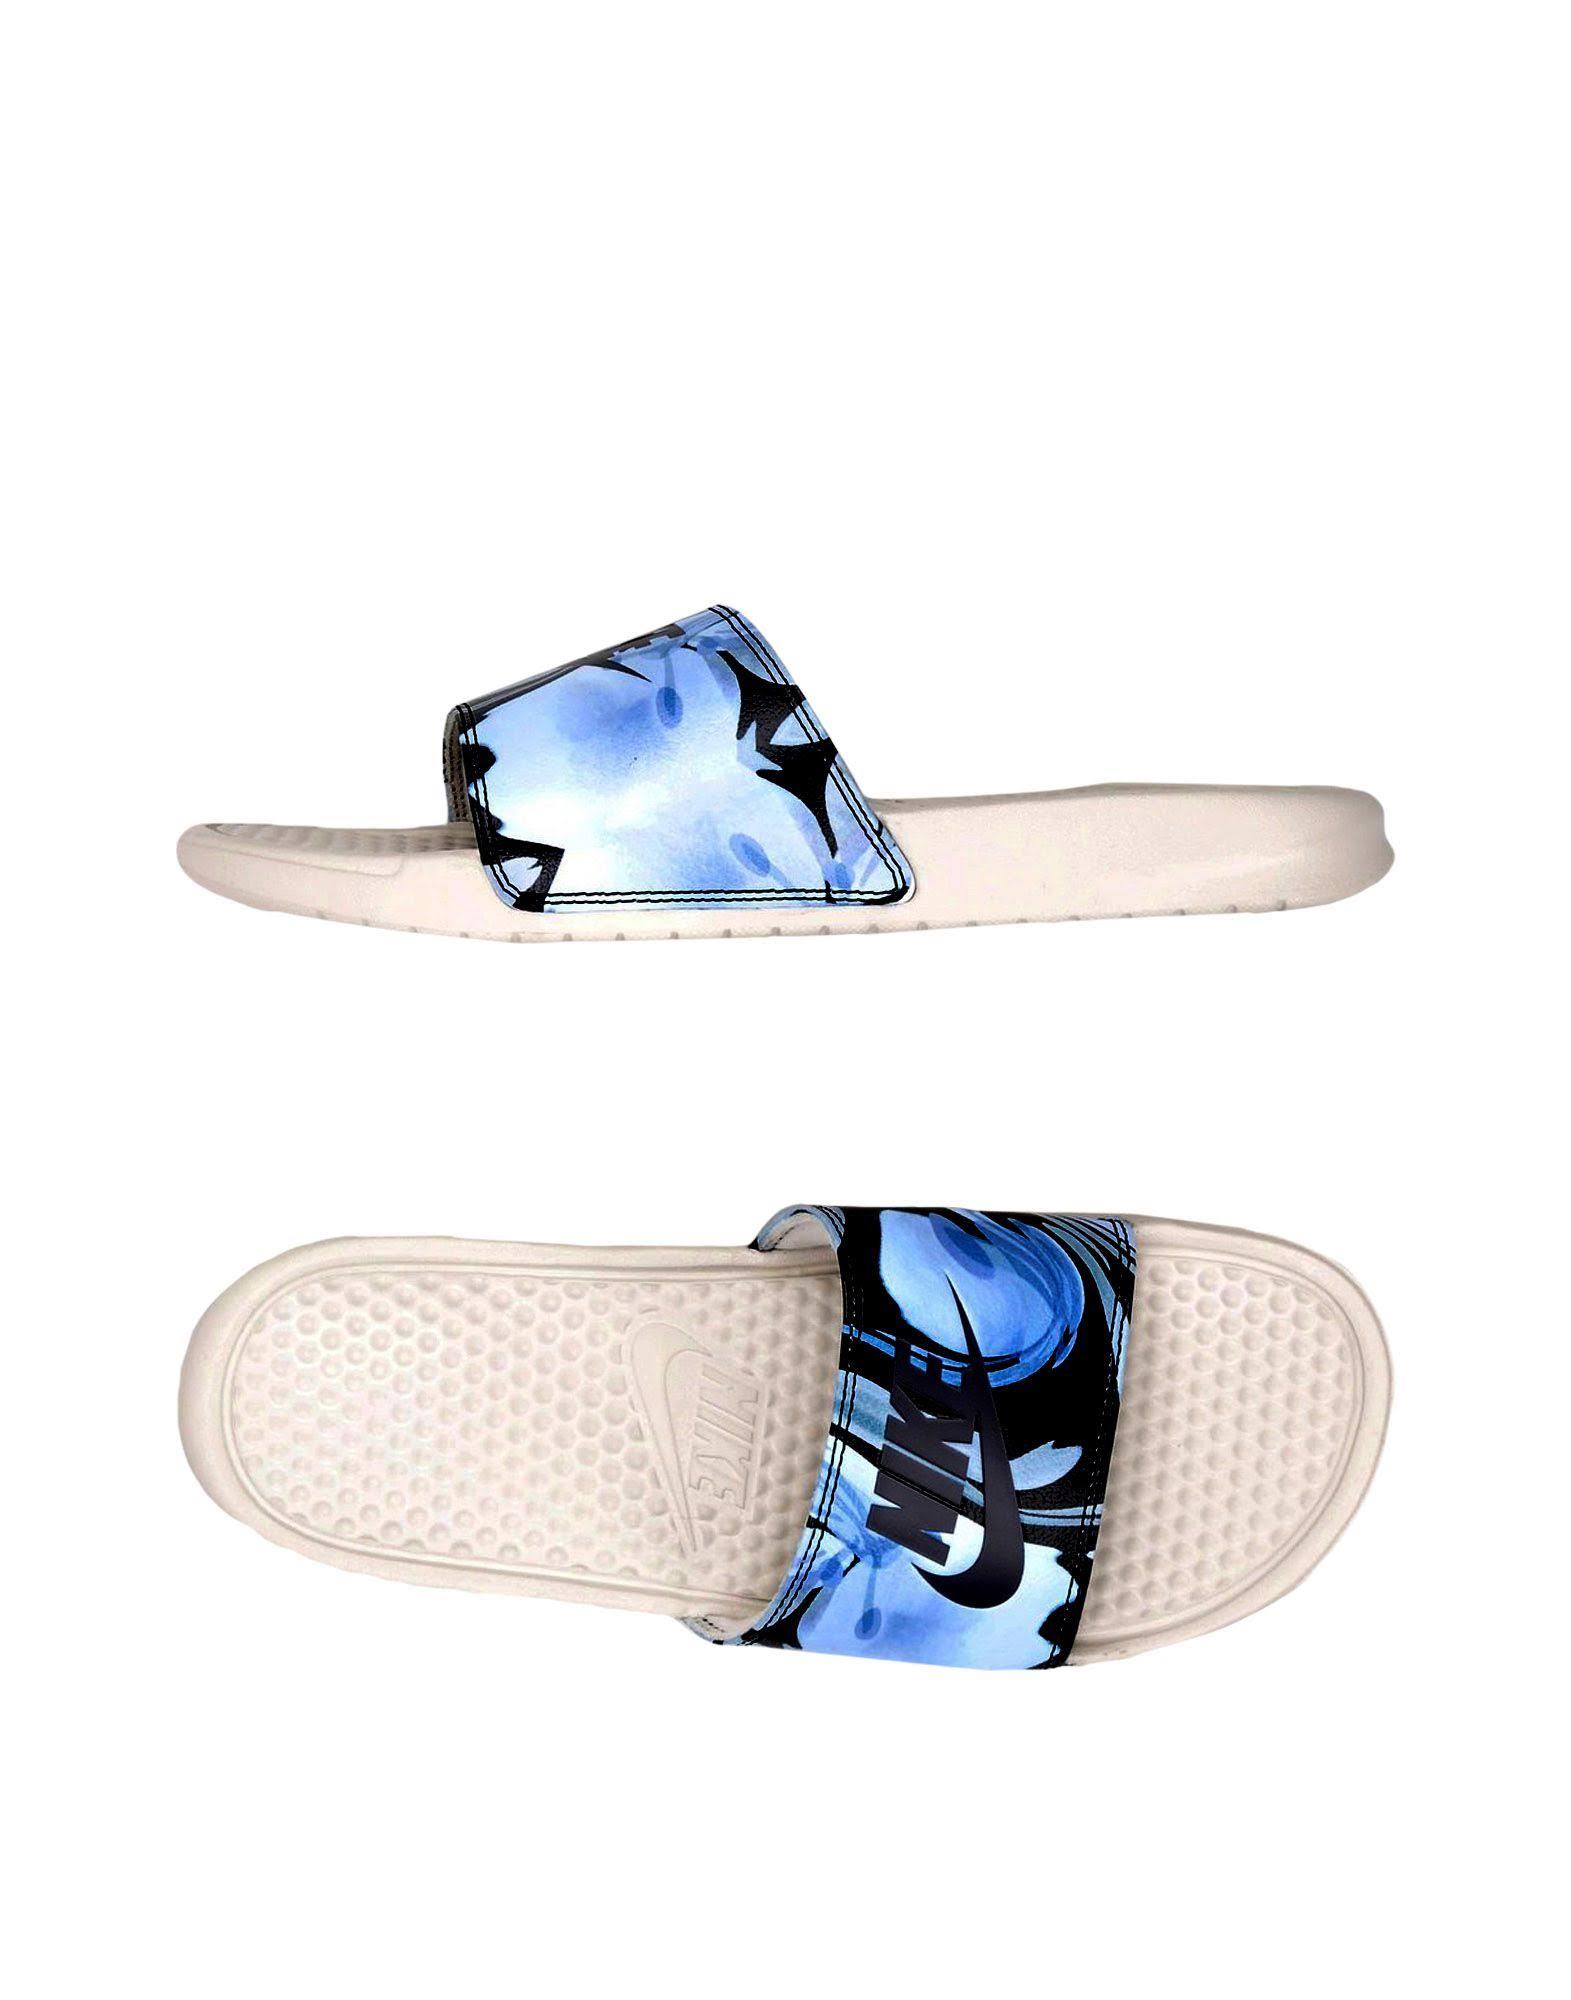 hemelsblauwe 35rubber Nike Print For sandalen Jdi Benassi Women 54RALq3j